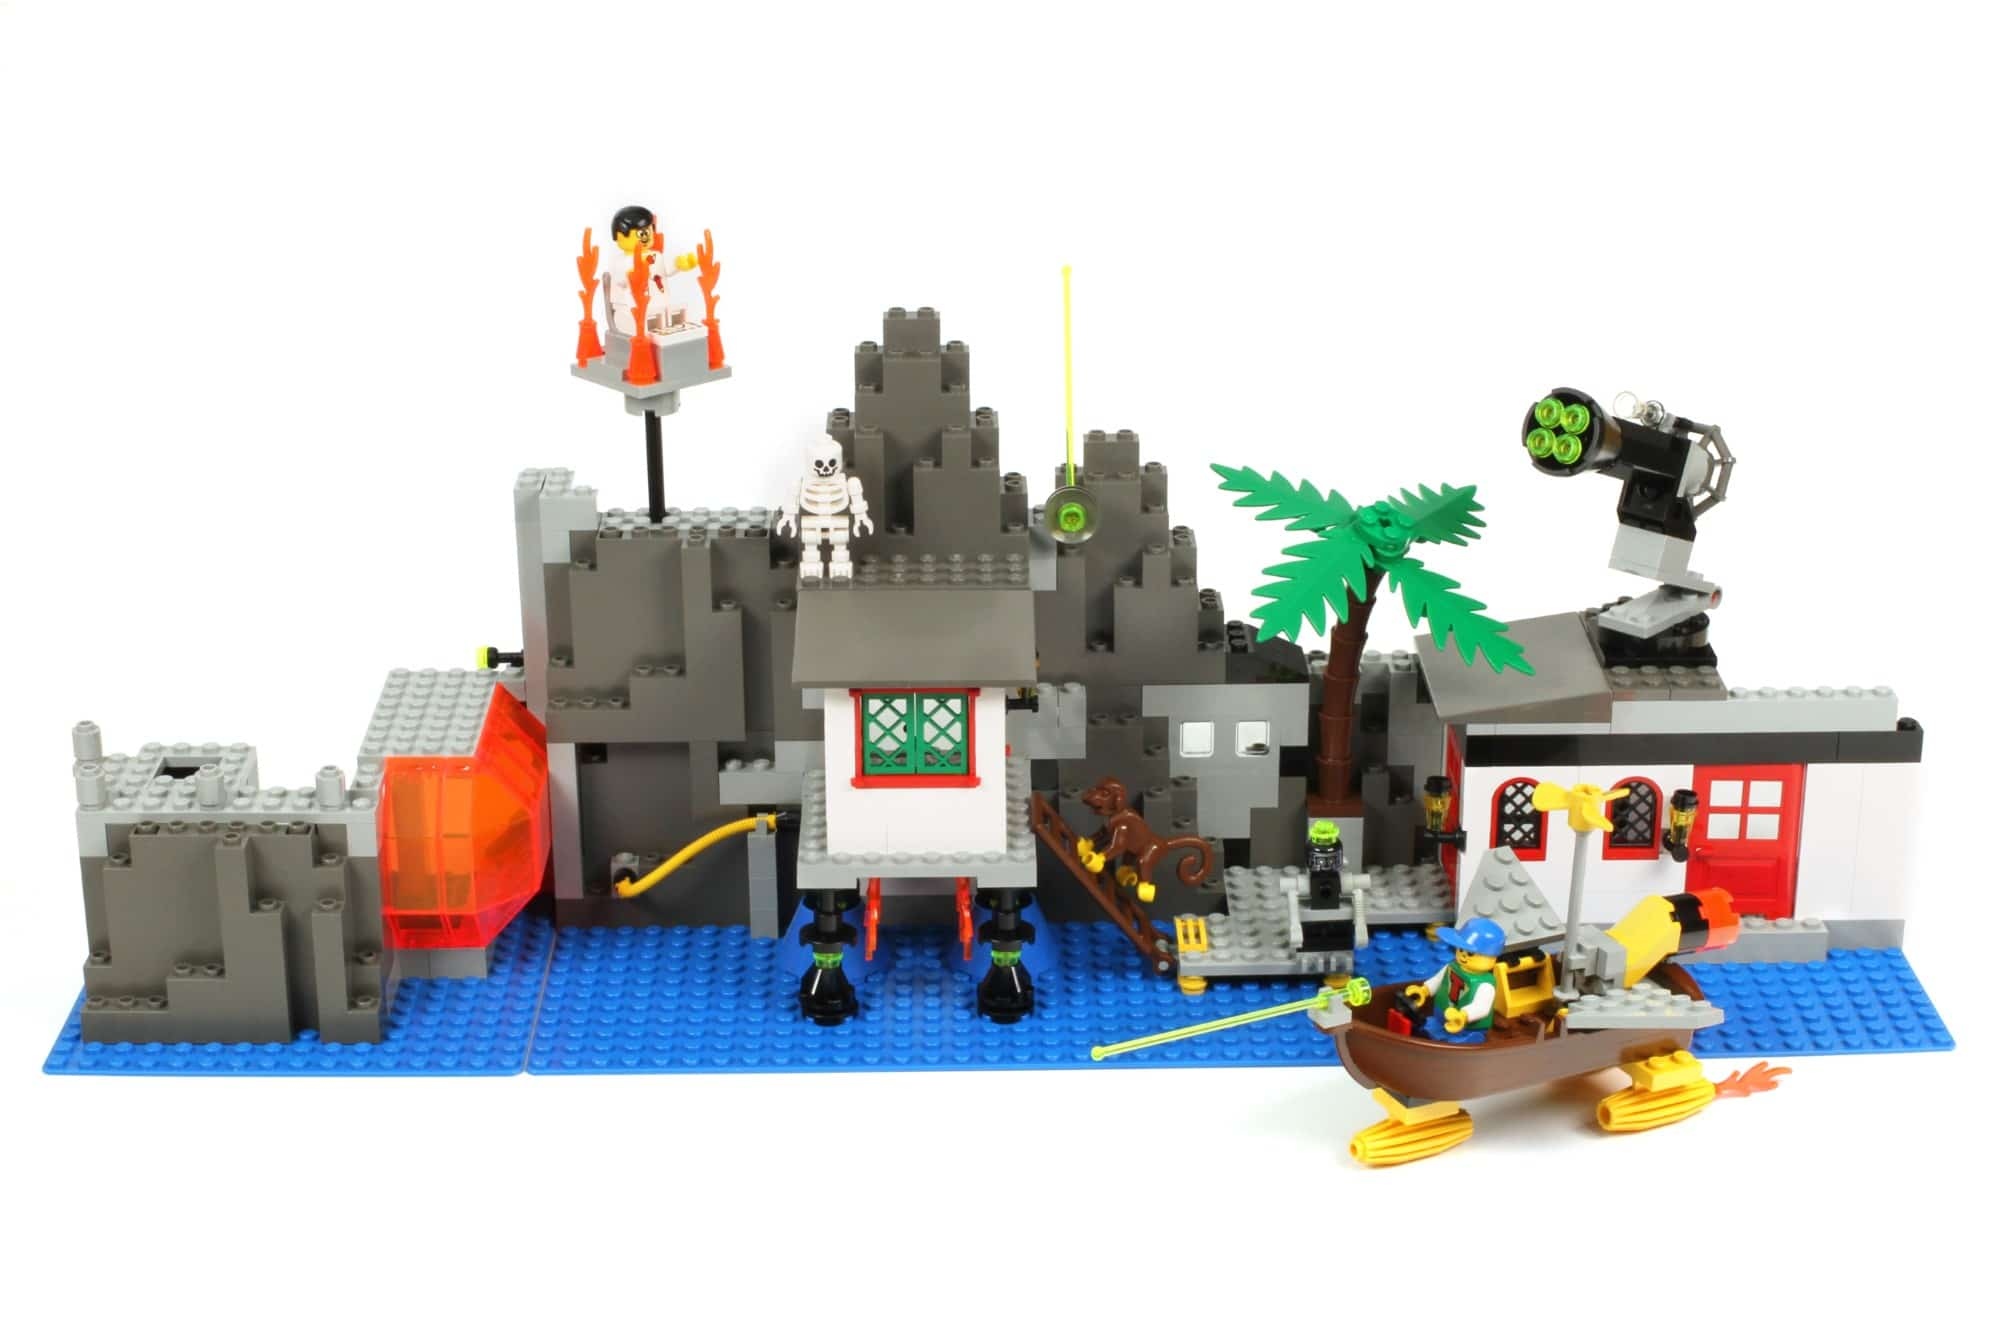 LEGO Time Cruisers 6494 Time Cruiser Labo 10